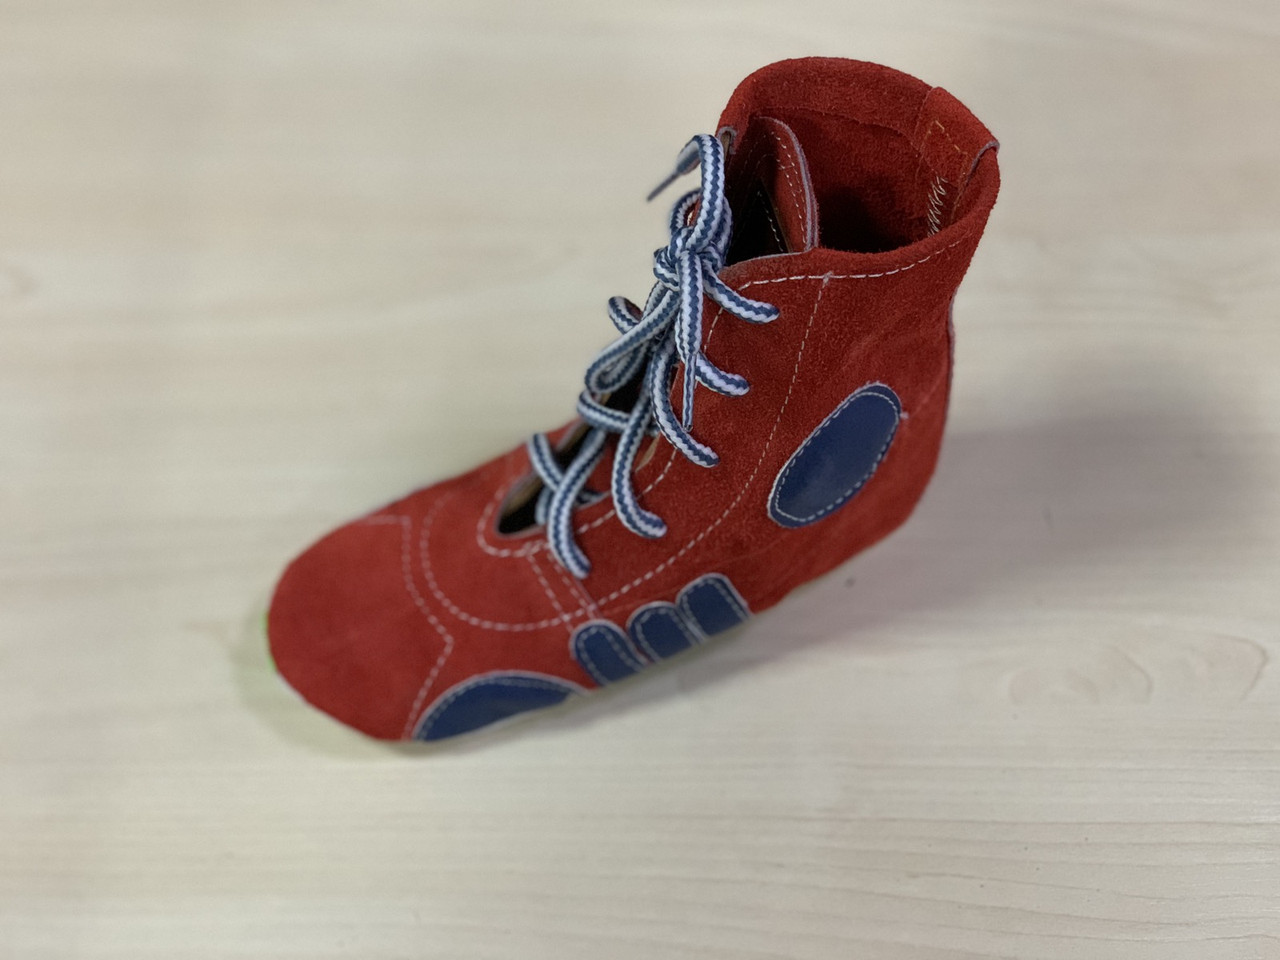 Борцовки Лерман красные с синими вставками подошва замш р.45